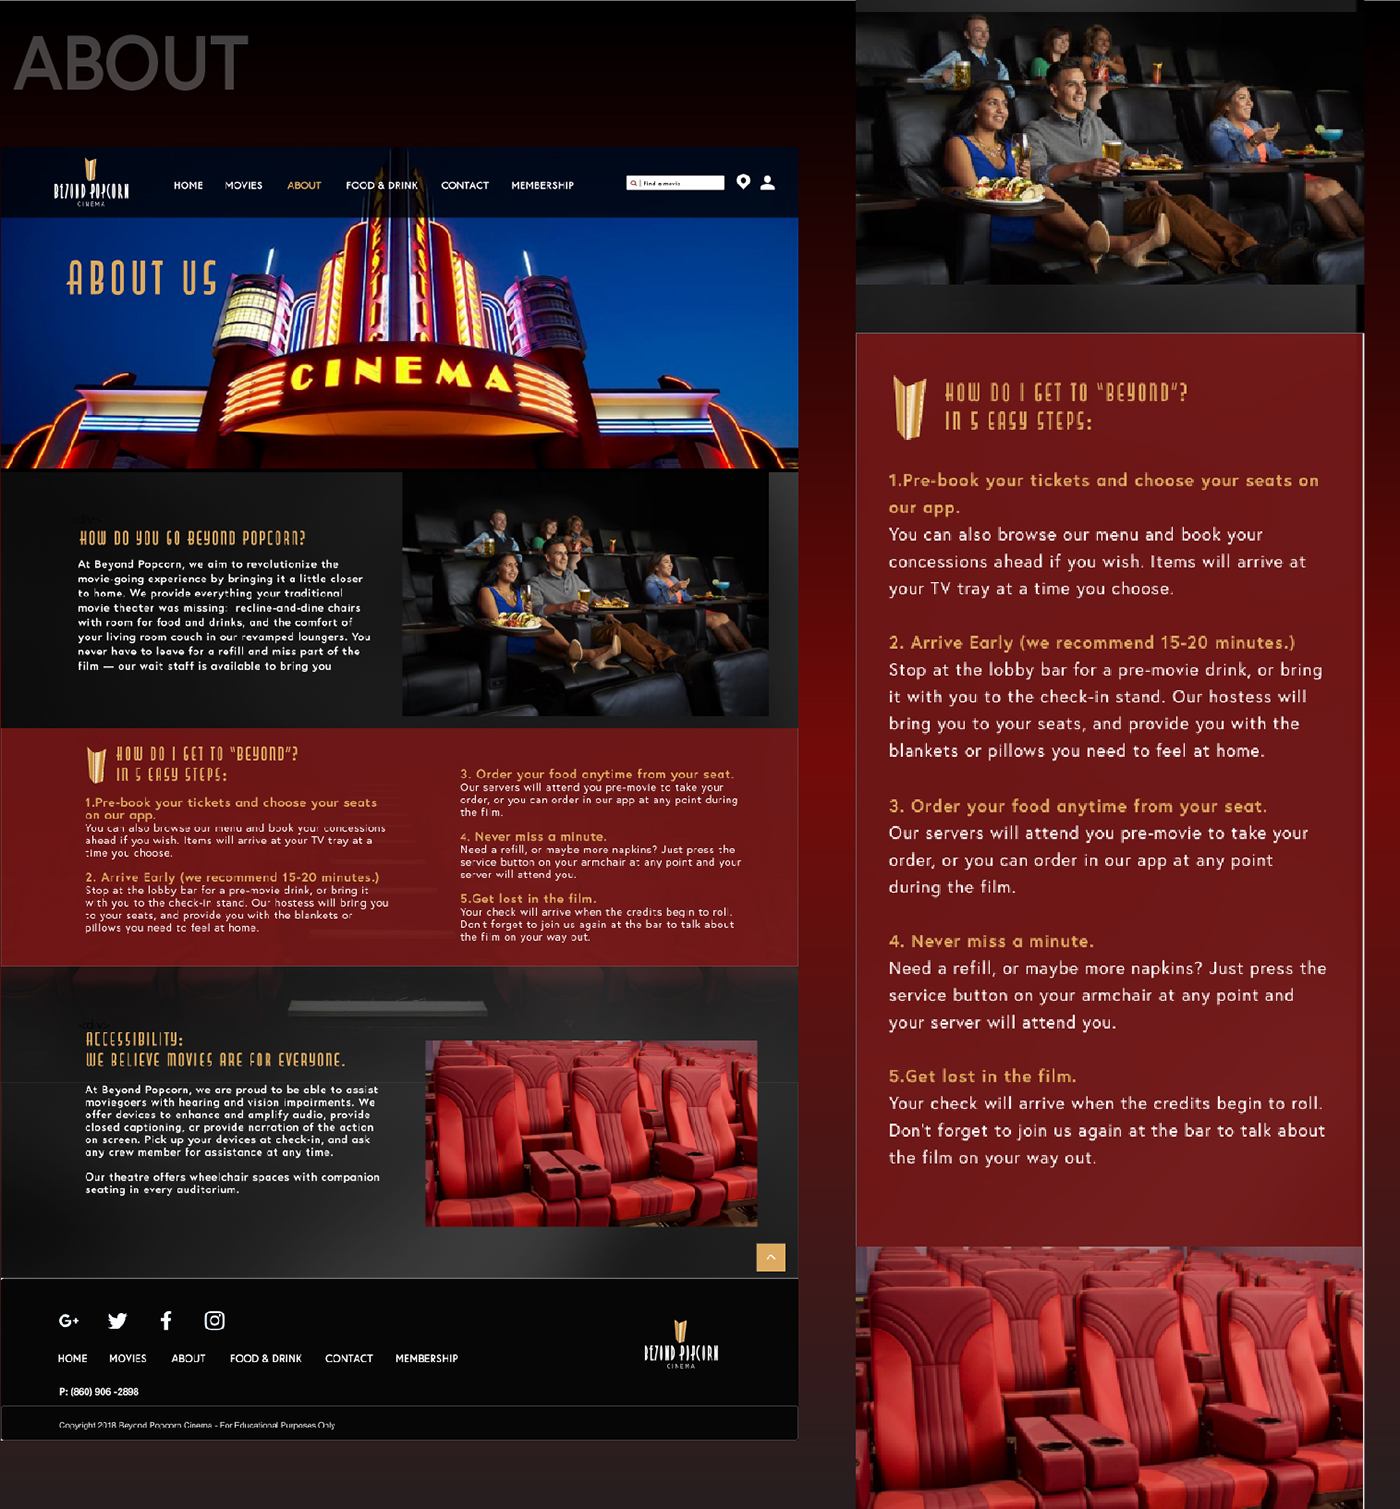 Beyond Popcorn - Movie Theater Website Design on Behance